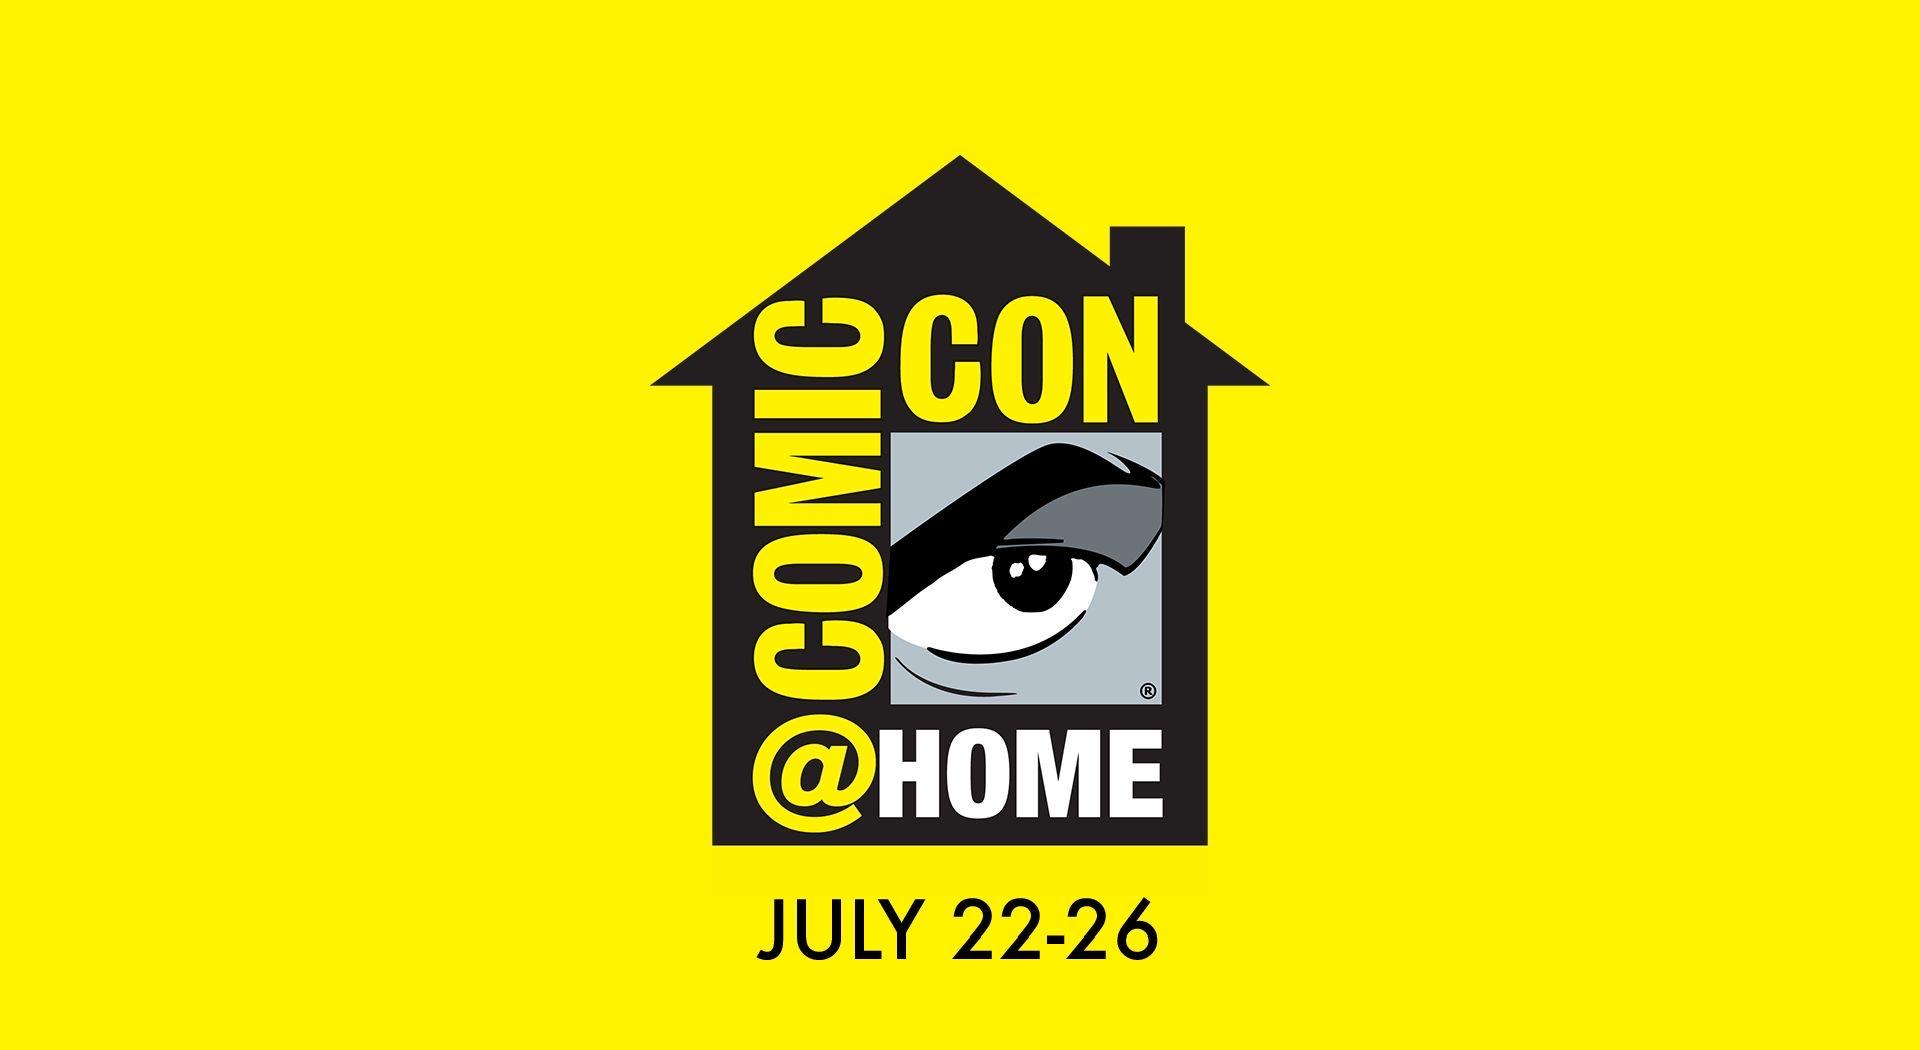 San Diego Comic-Con@Home